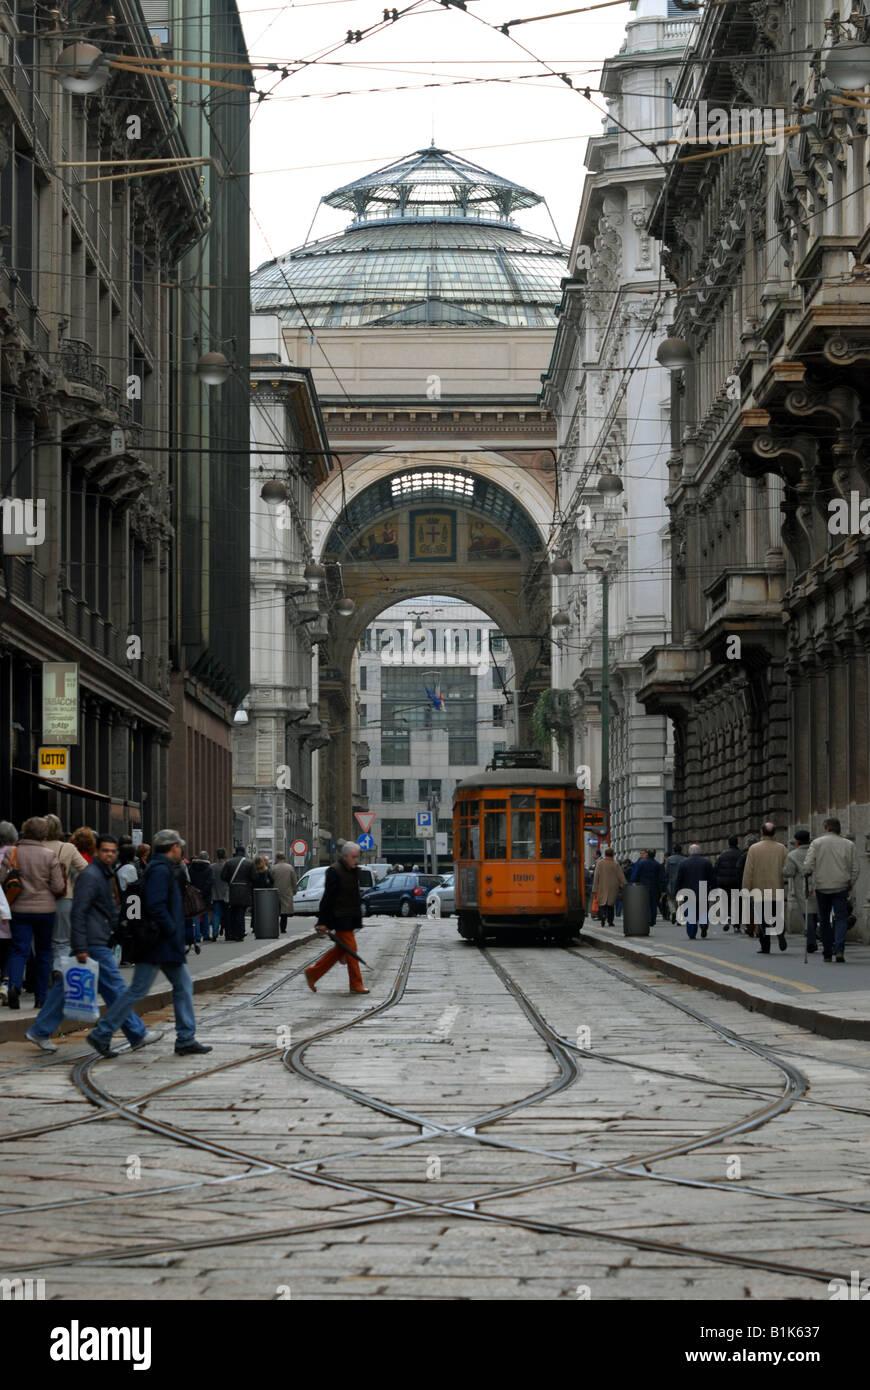 Galleria Vittorio Emanuele II as seen down Via Tommaso Grossi from Piazza Cordusio, Milano, Lombardy, Italy. - Stock Image